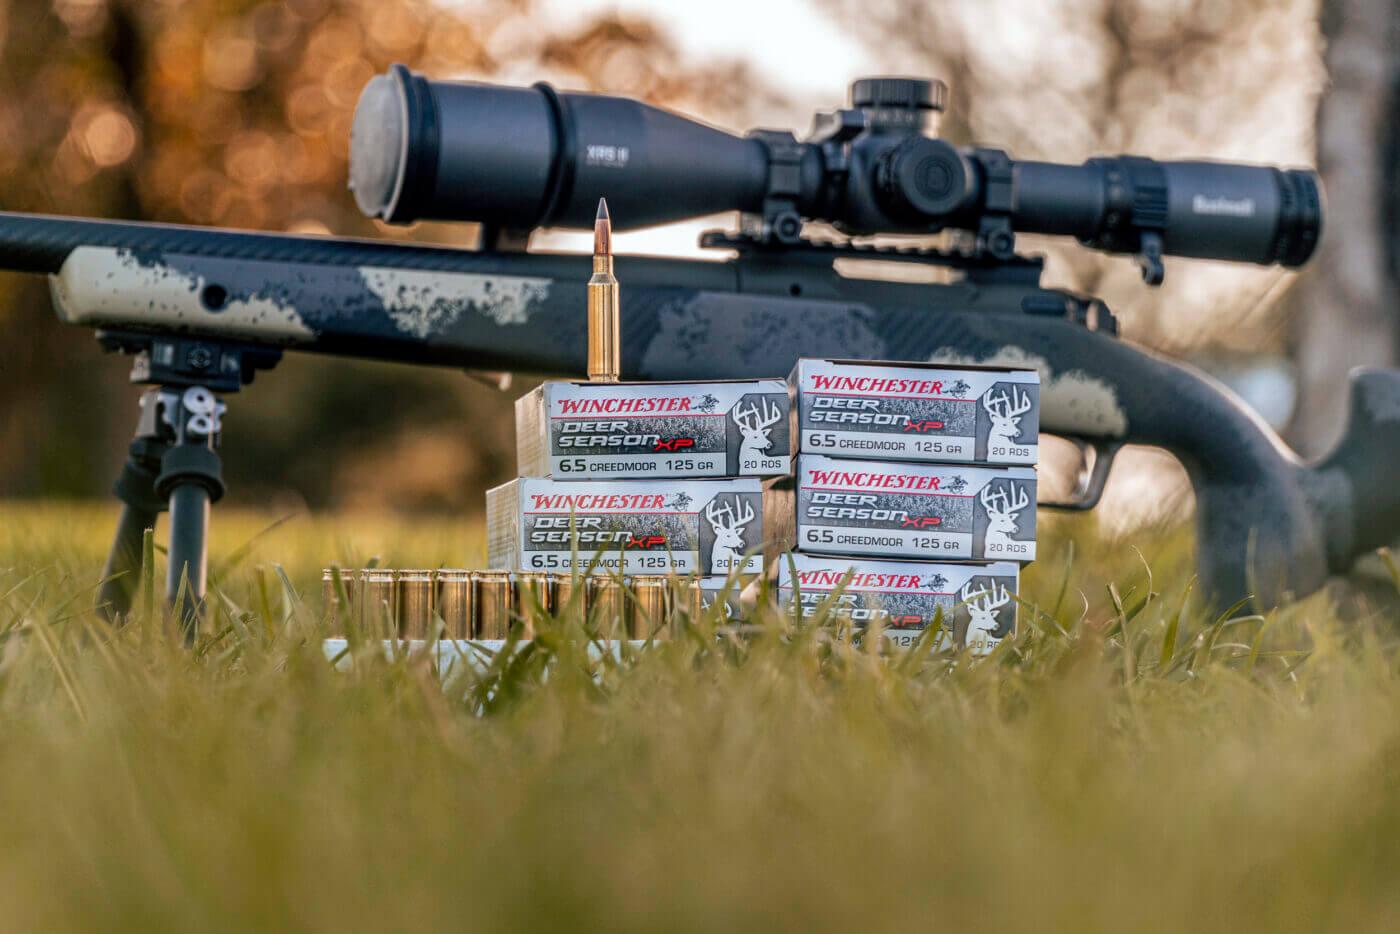 Deer Hunter XP 6.5 Creedmoor with Waypoint rifle